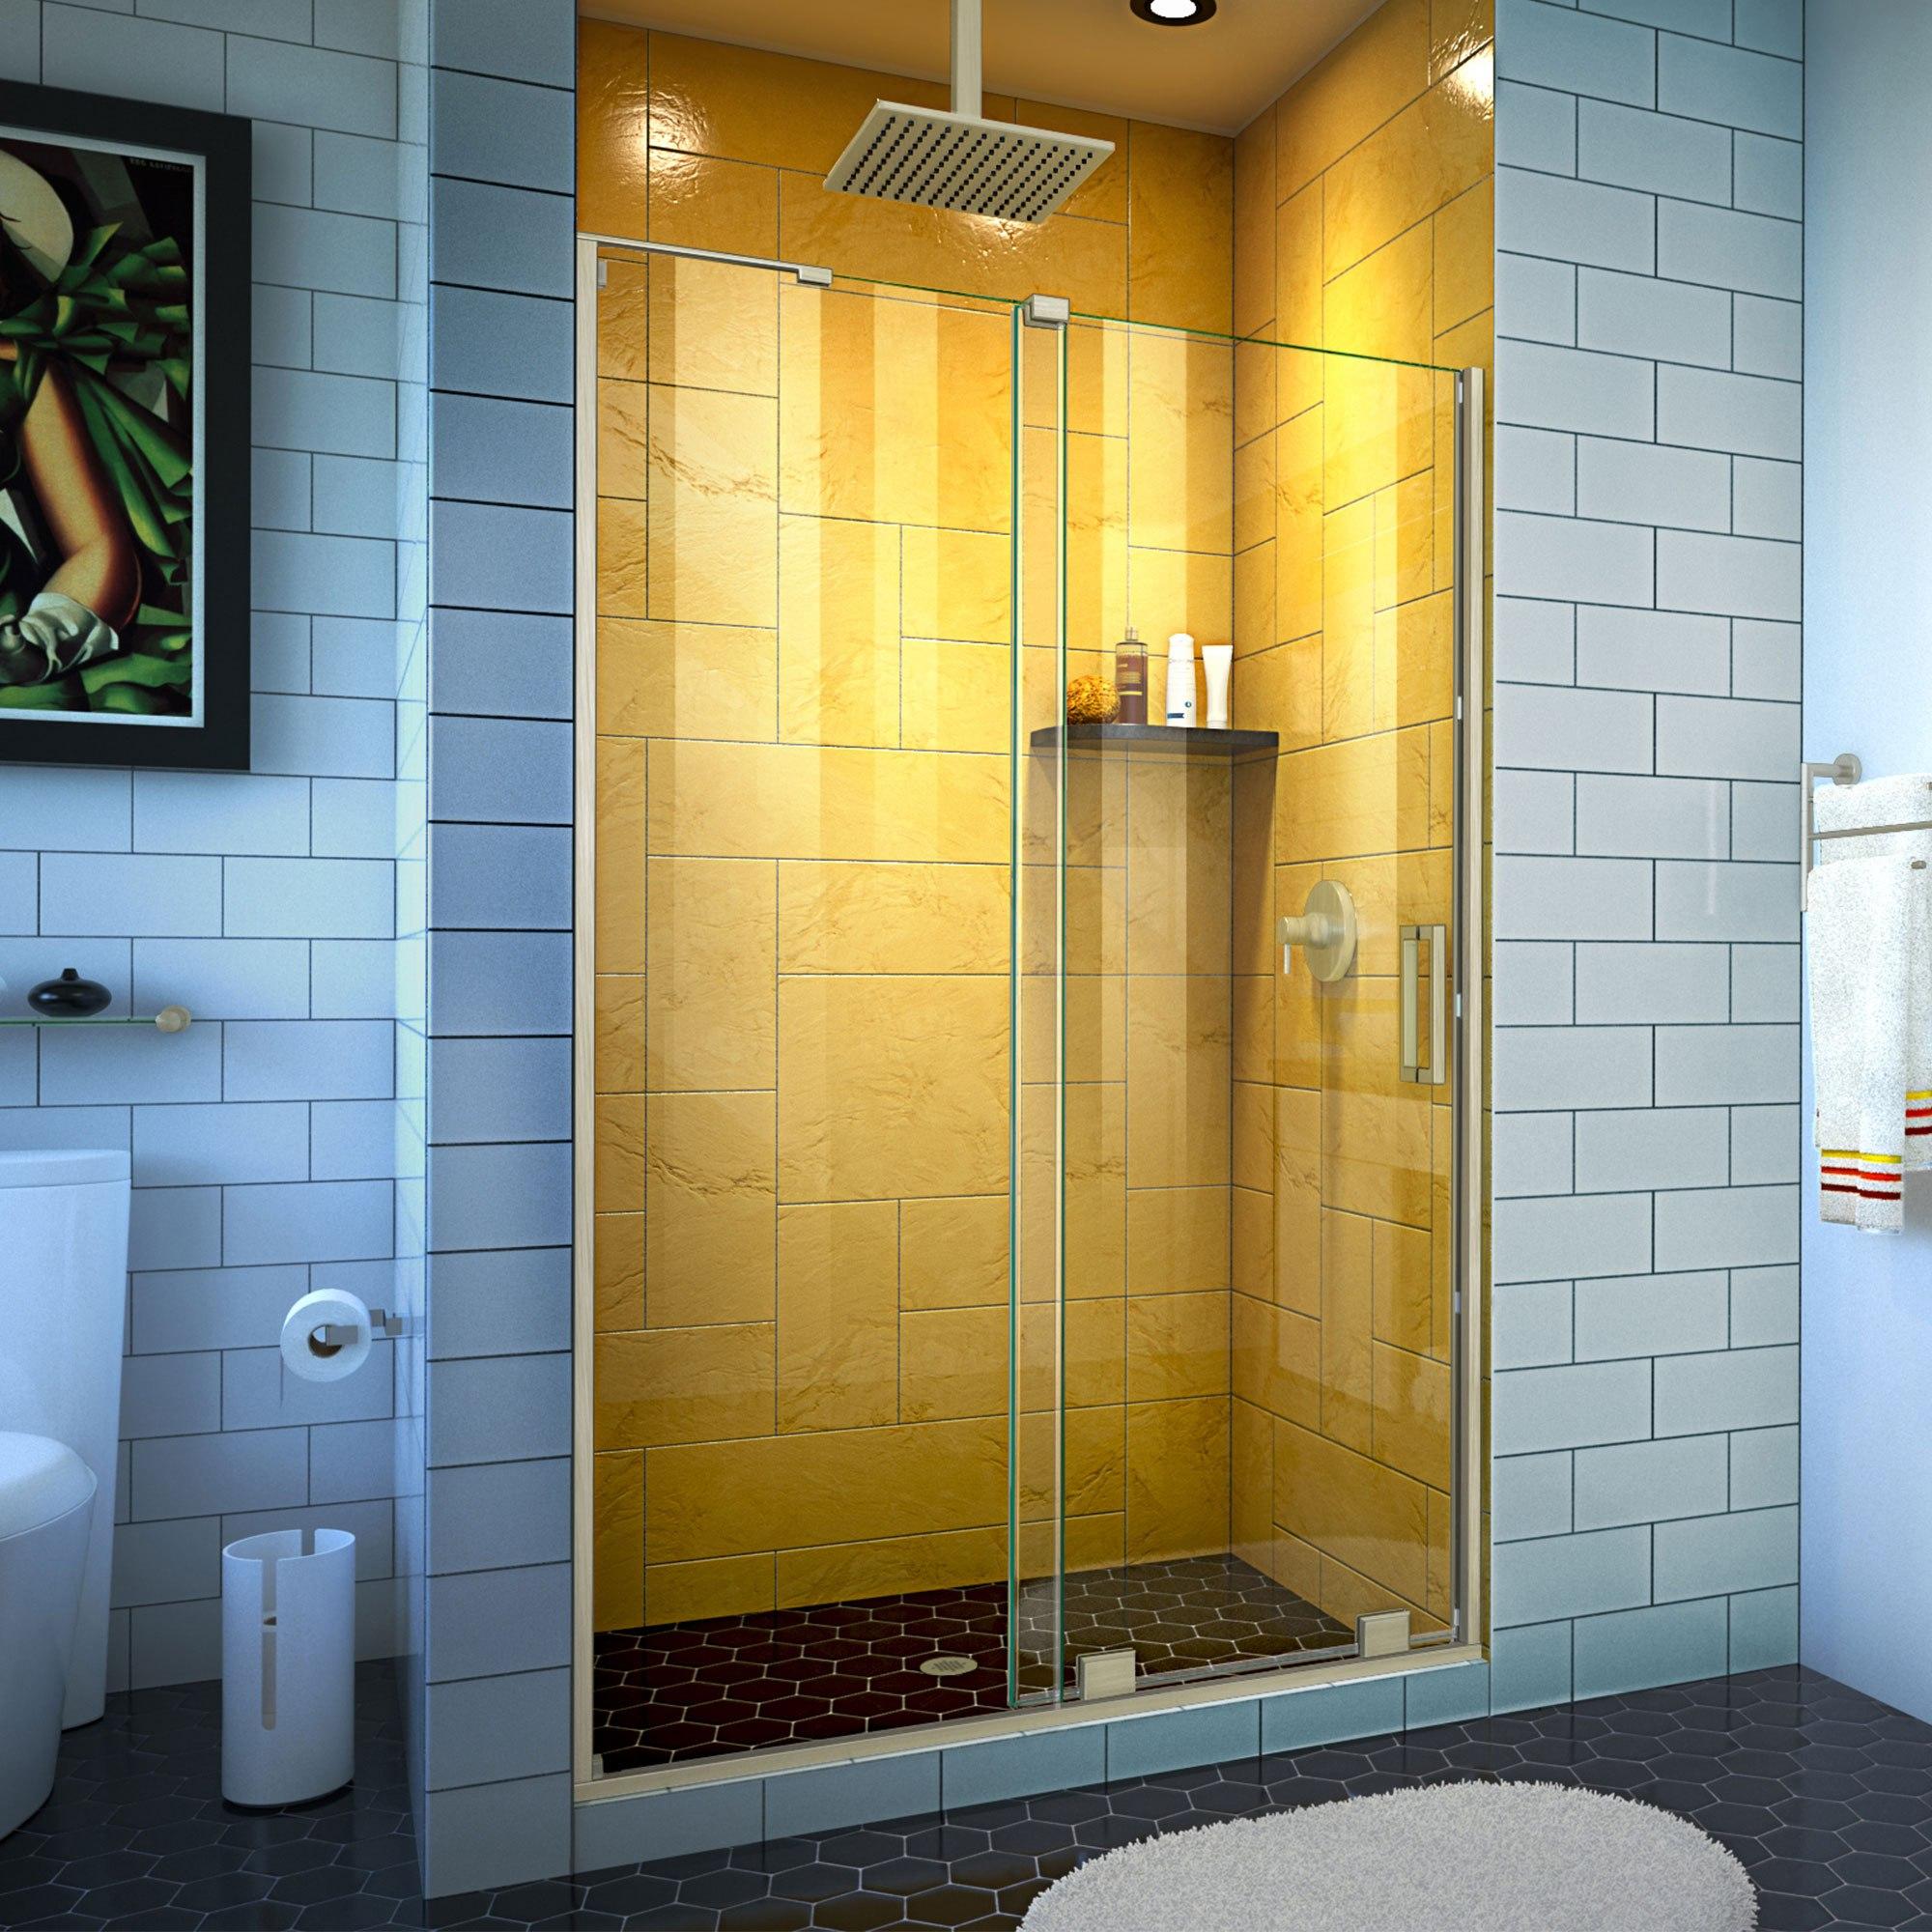 Dreamline Shdr 1948724 Mirage Z 44 48 Inch W X 72 Inch H Frameless Sliding Shower Door